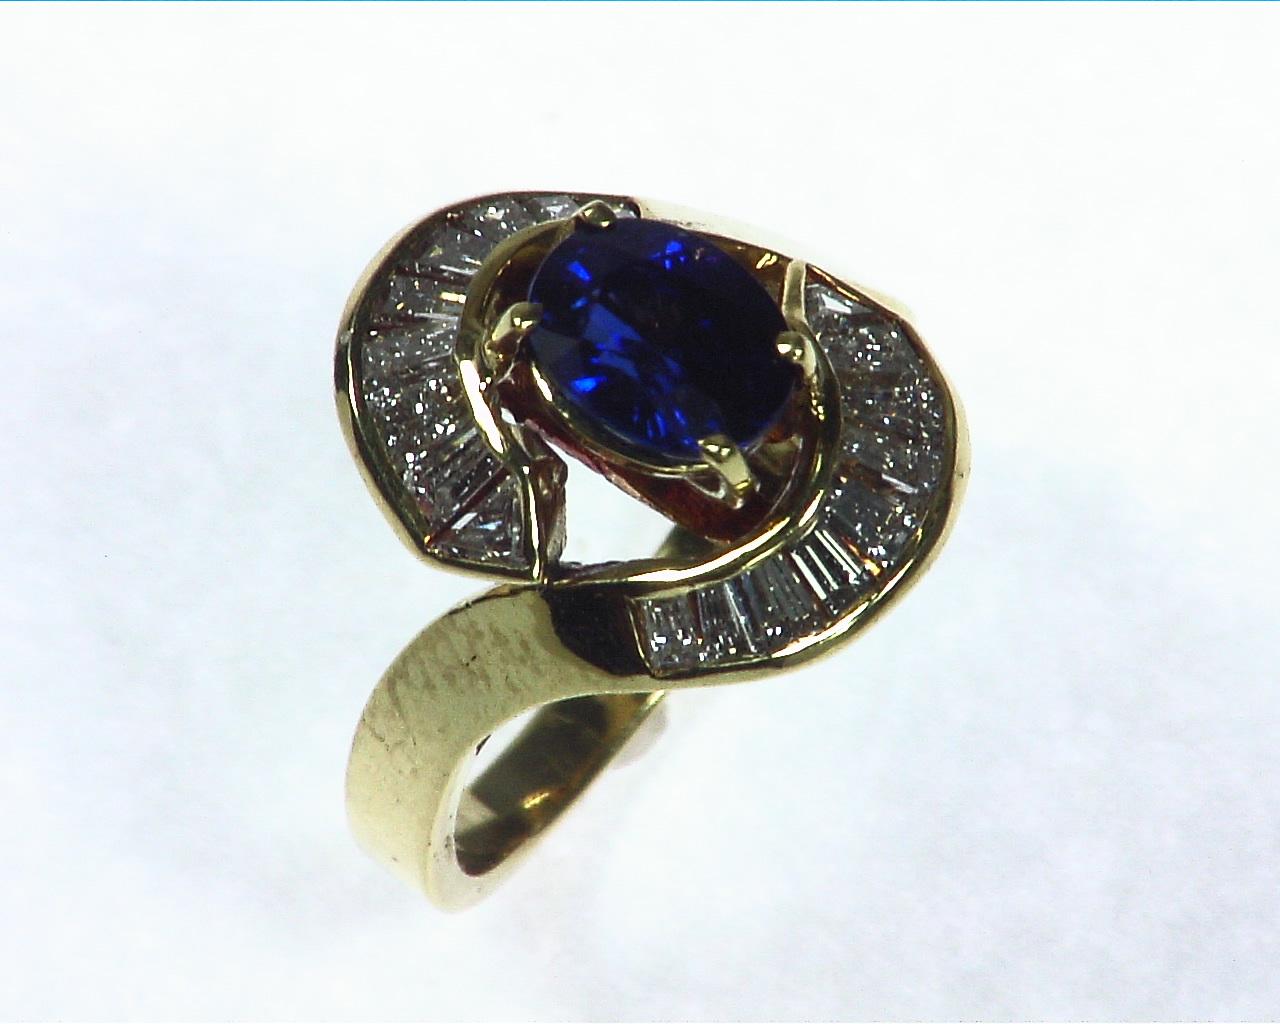 Blue Ceylon Sapphires Engagement Ring 18kt Lady,s Ring RFK,256 6